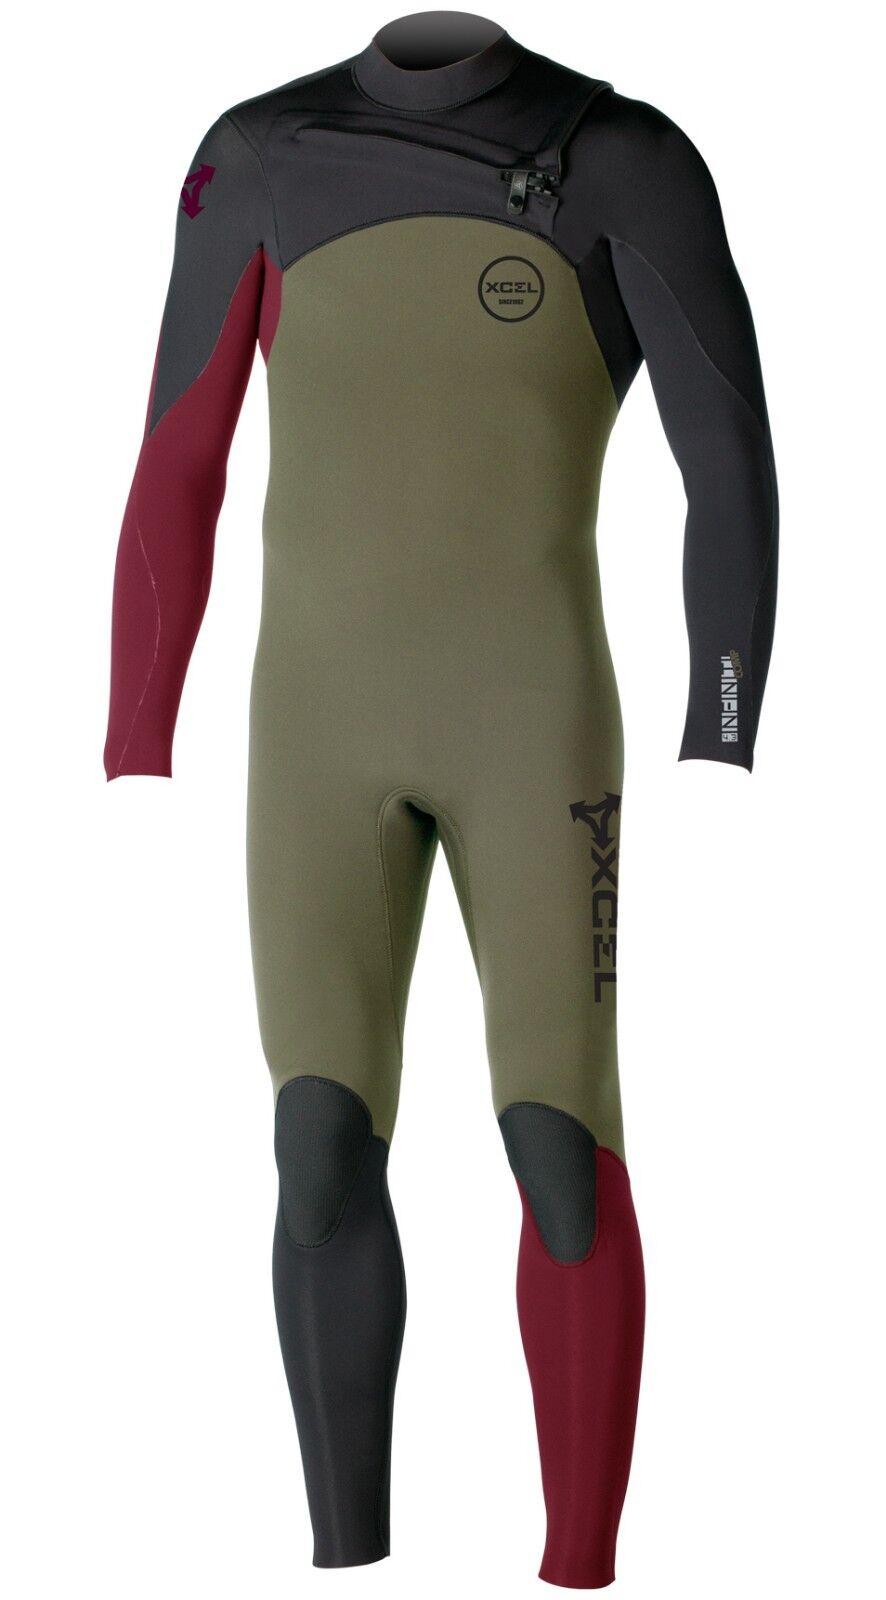 XCEL Men's 3 2 INFINITI COMP X Zip Wetsuit - SBR - Large Tall - NWT